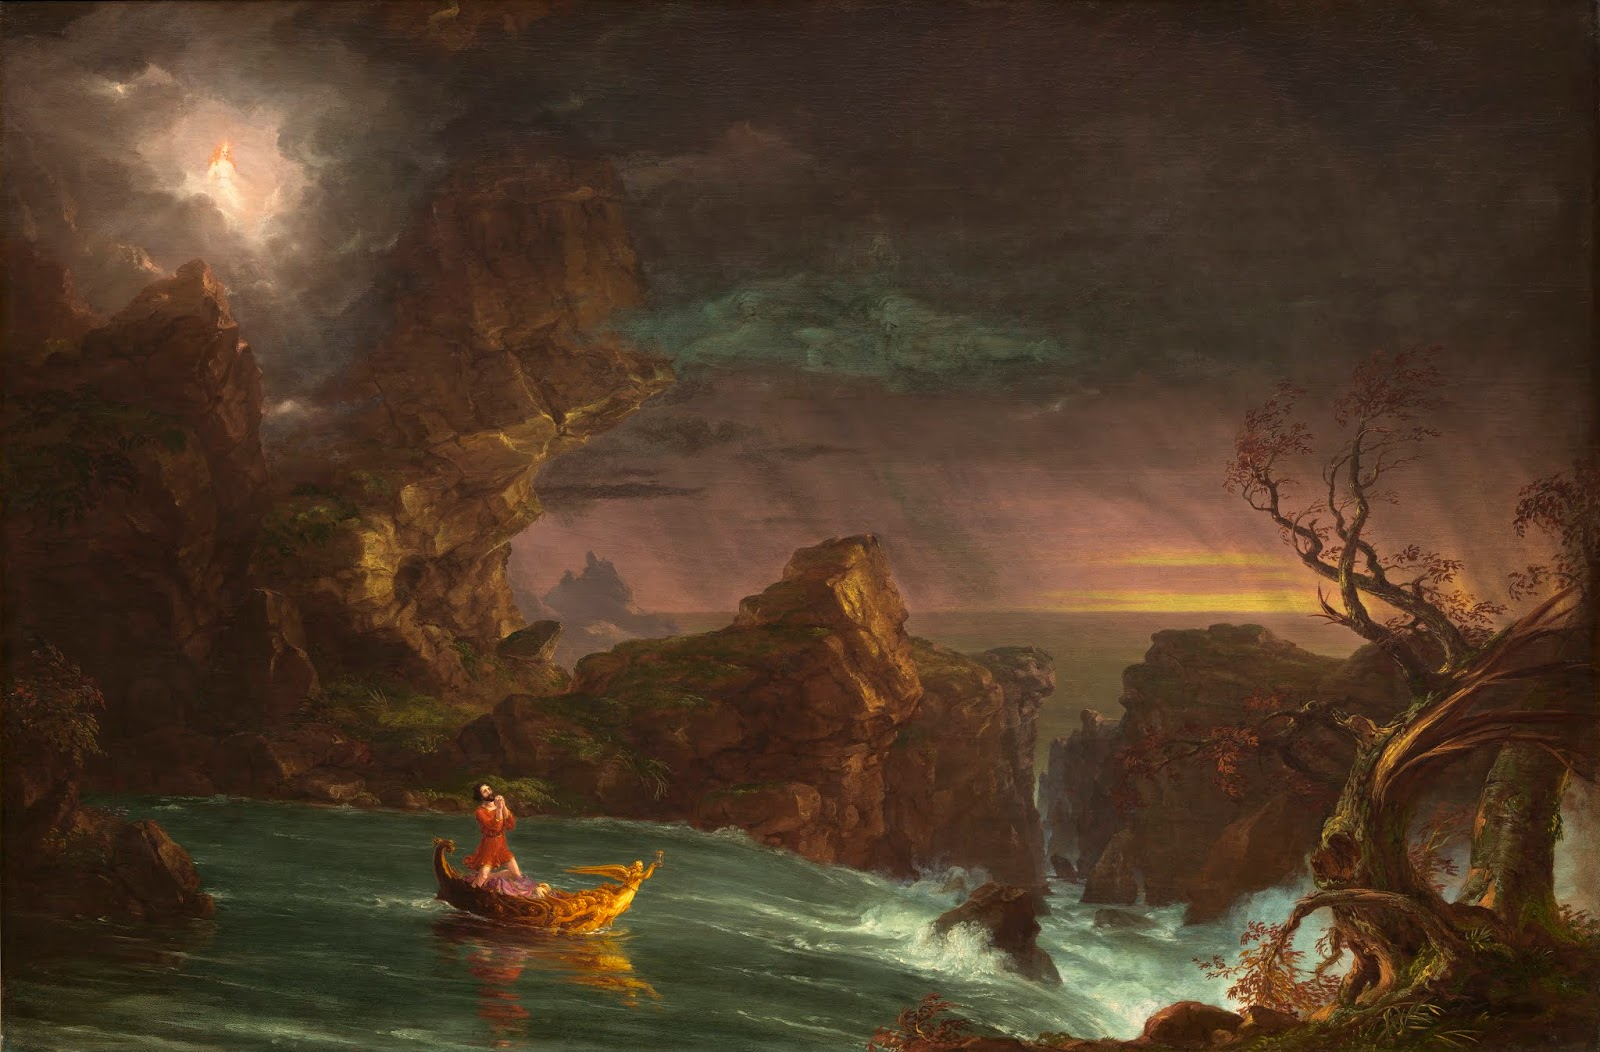 Pintura de Thomas Cole